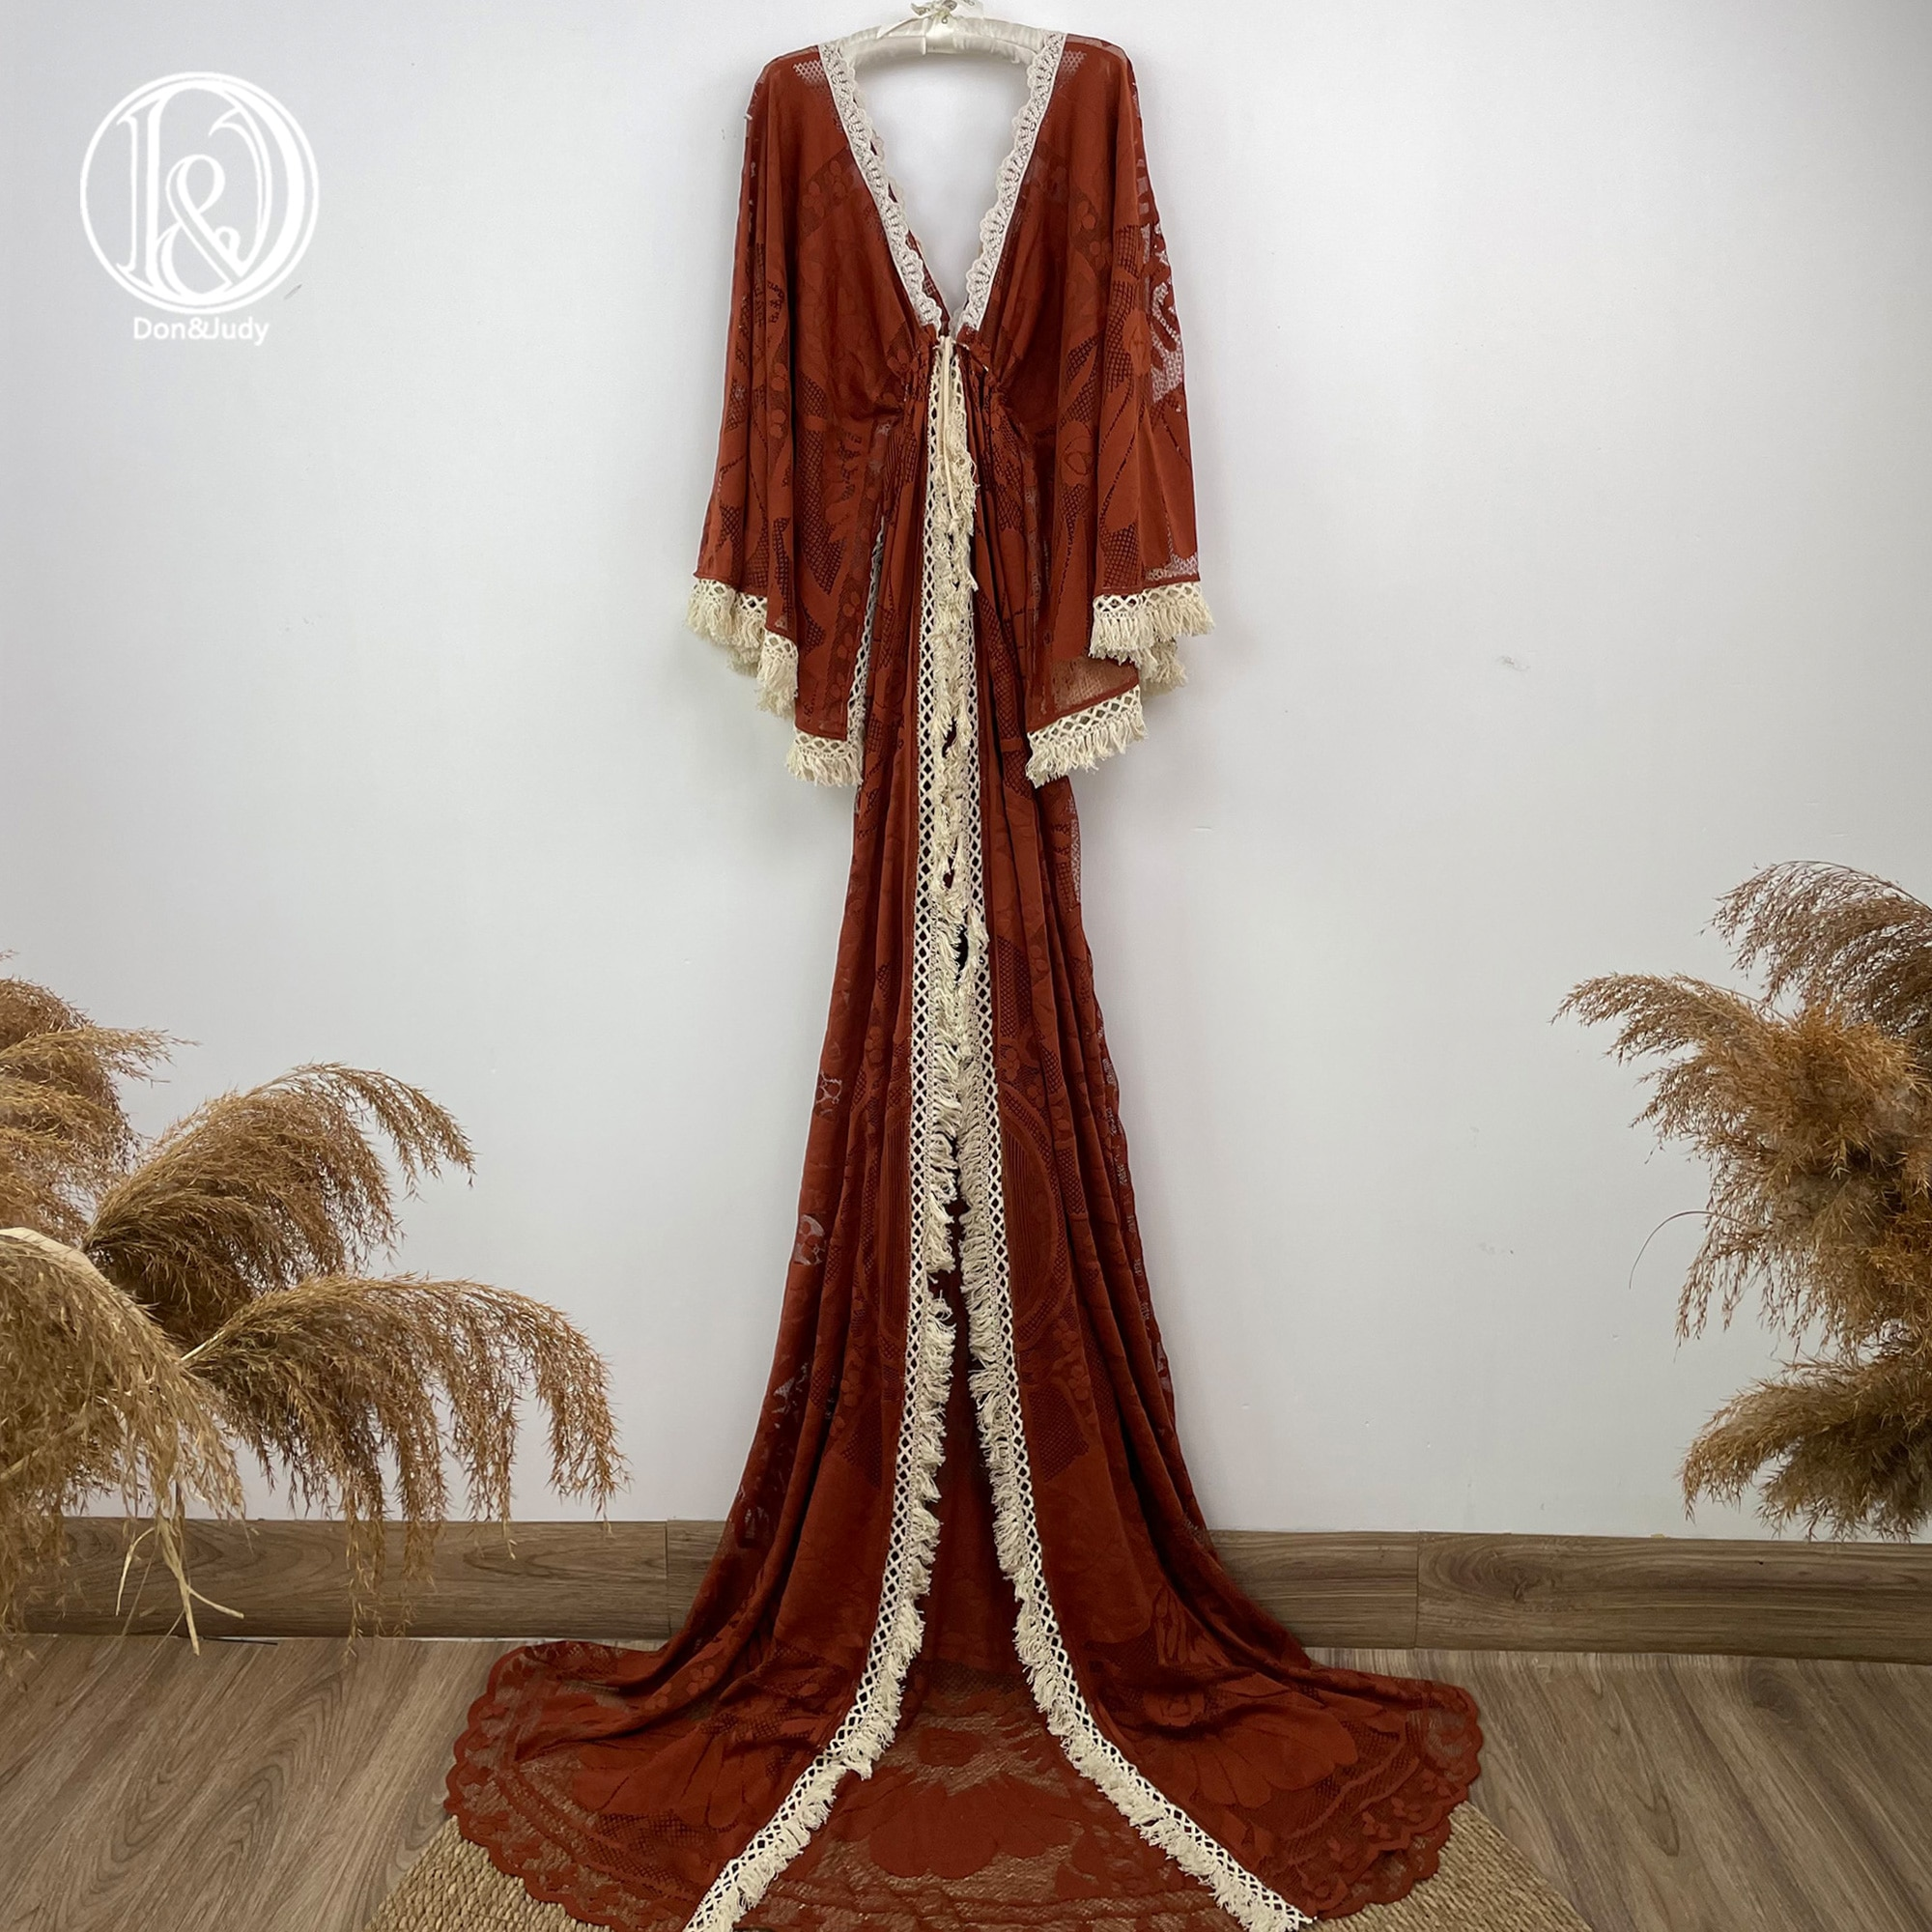 Don&Judy Boho Lace Maternity Photography Props Dresses Maternity Photo Shoot Cardigan Dress Pregnancy Women Long Maxi Gown 2021